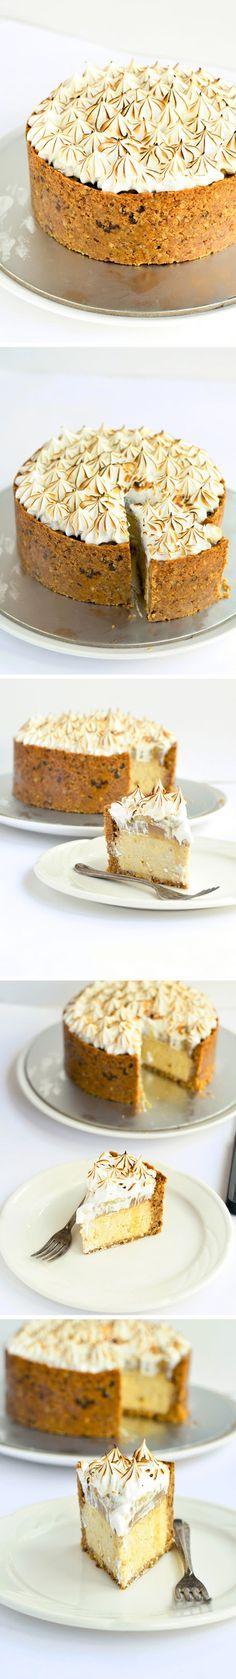 tarta-banoffee-4-cheesecake-pecados-reposteria-1